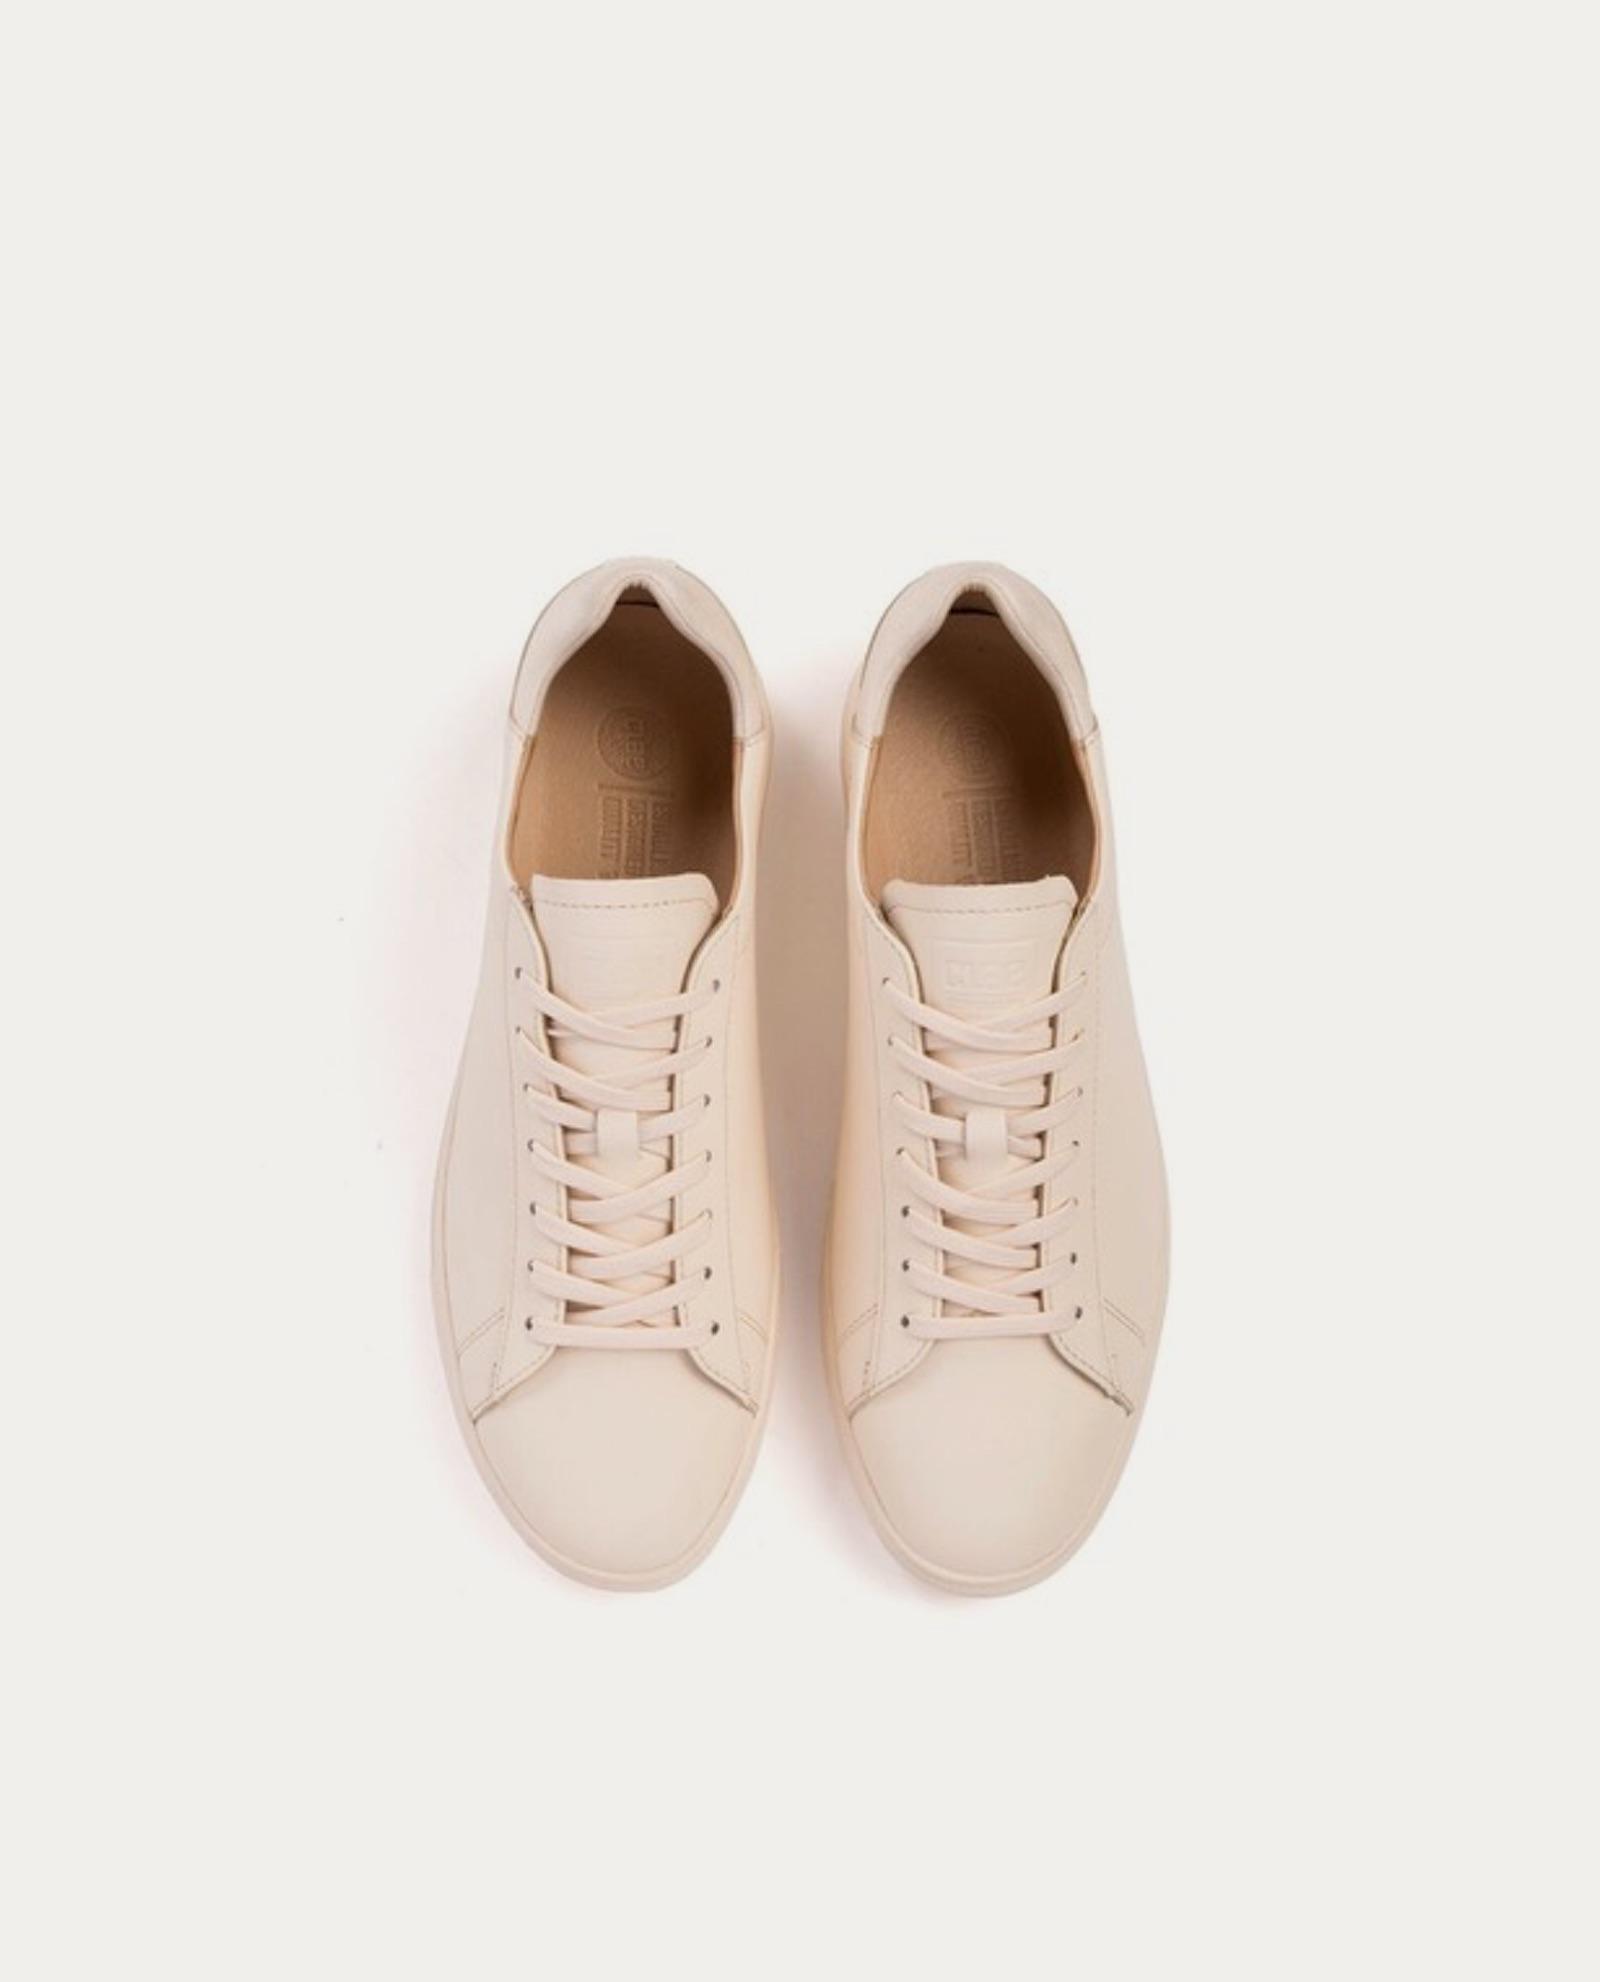 clae_chaussure_sniquers_bradley_leather_ecru_3